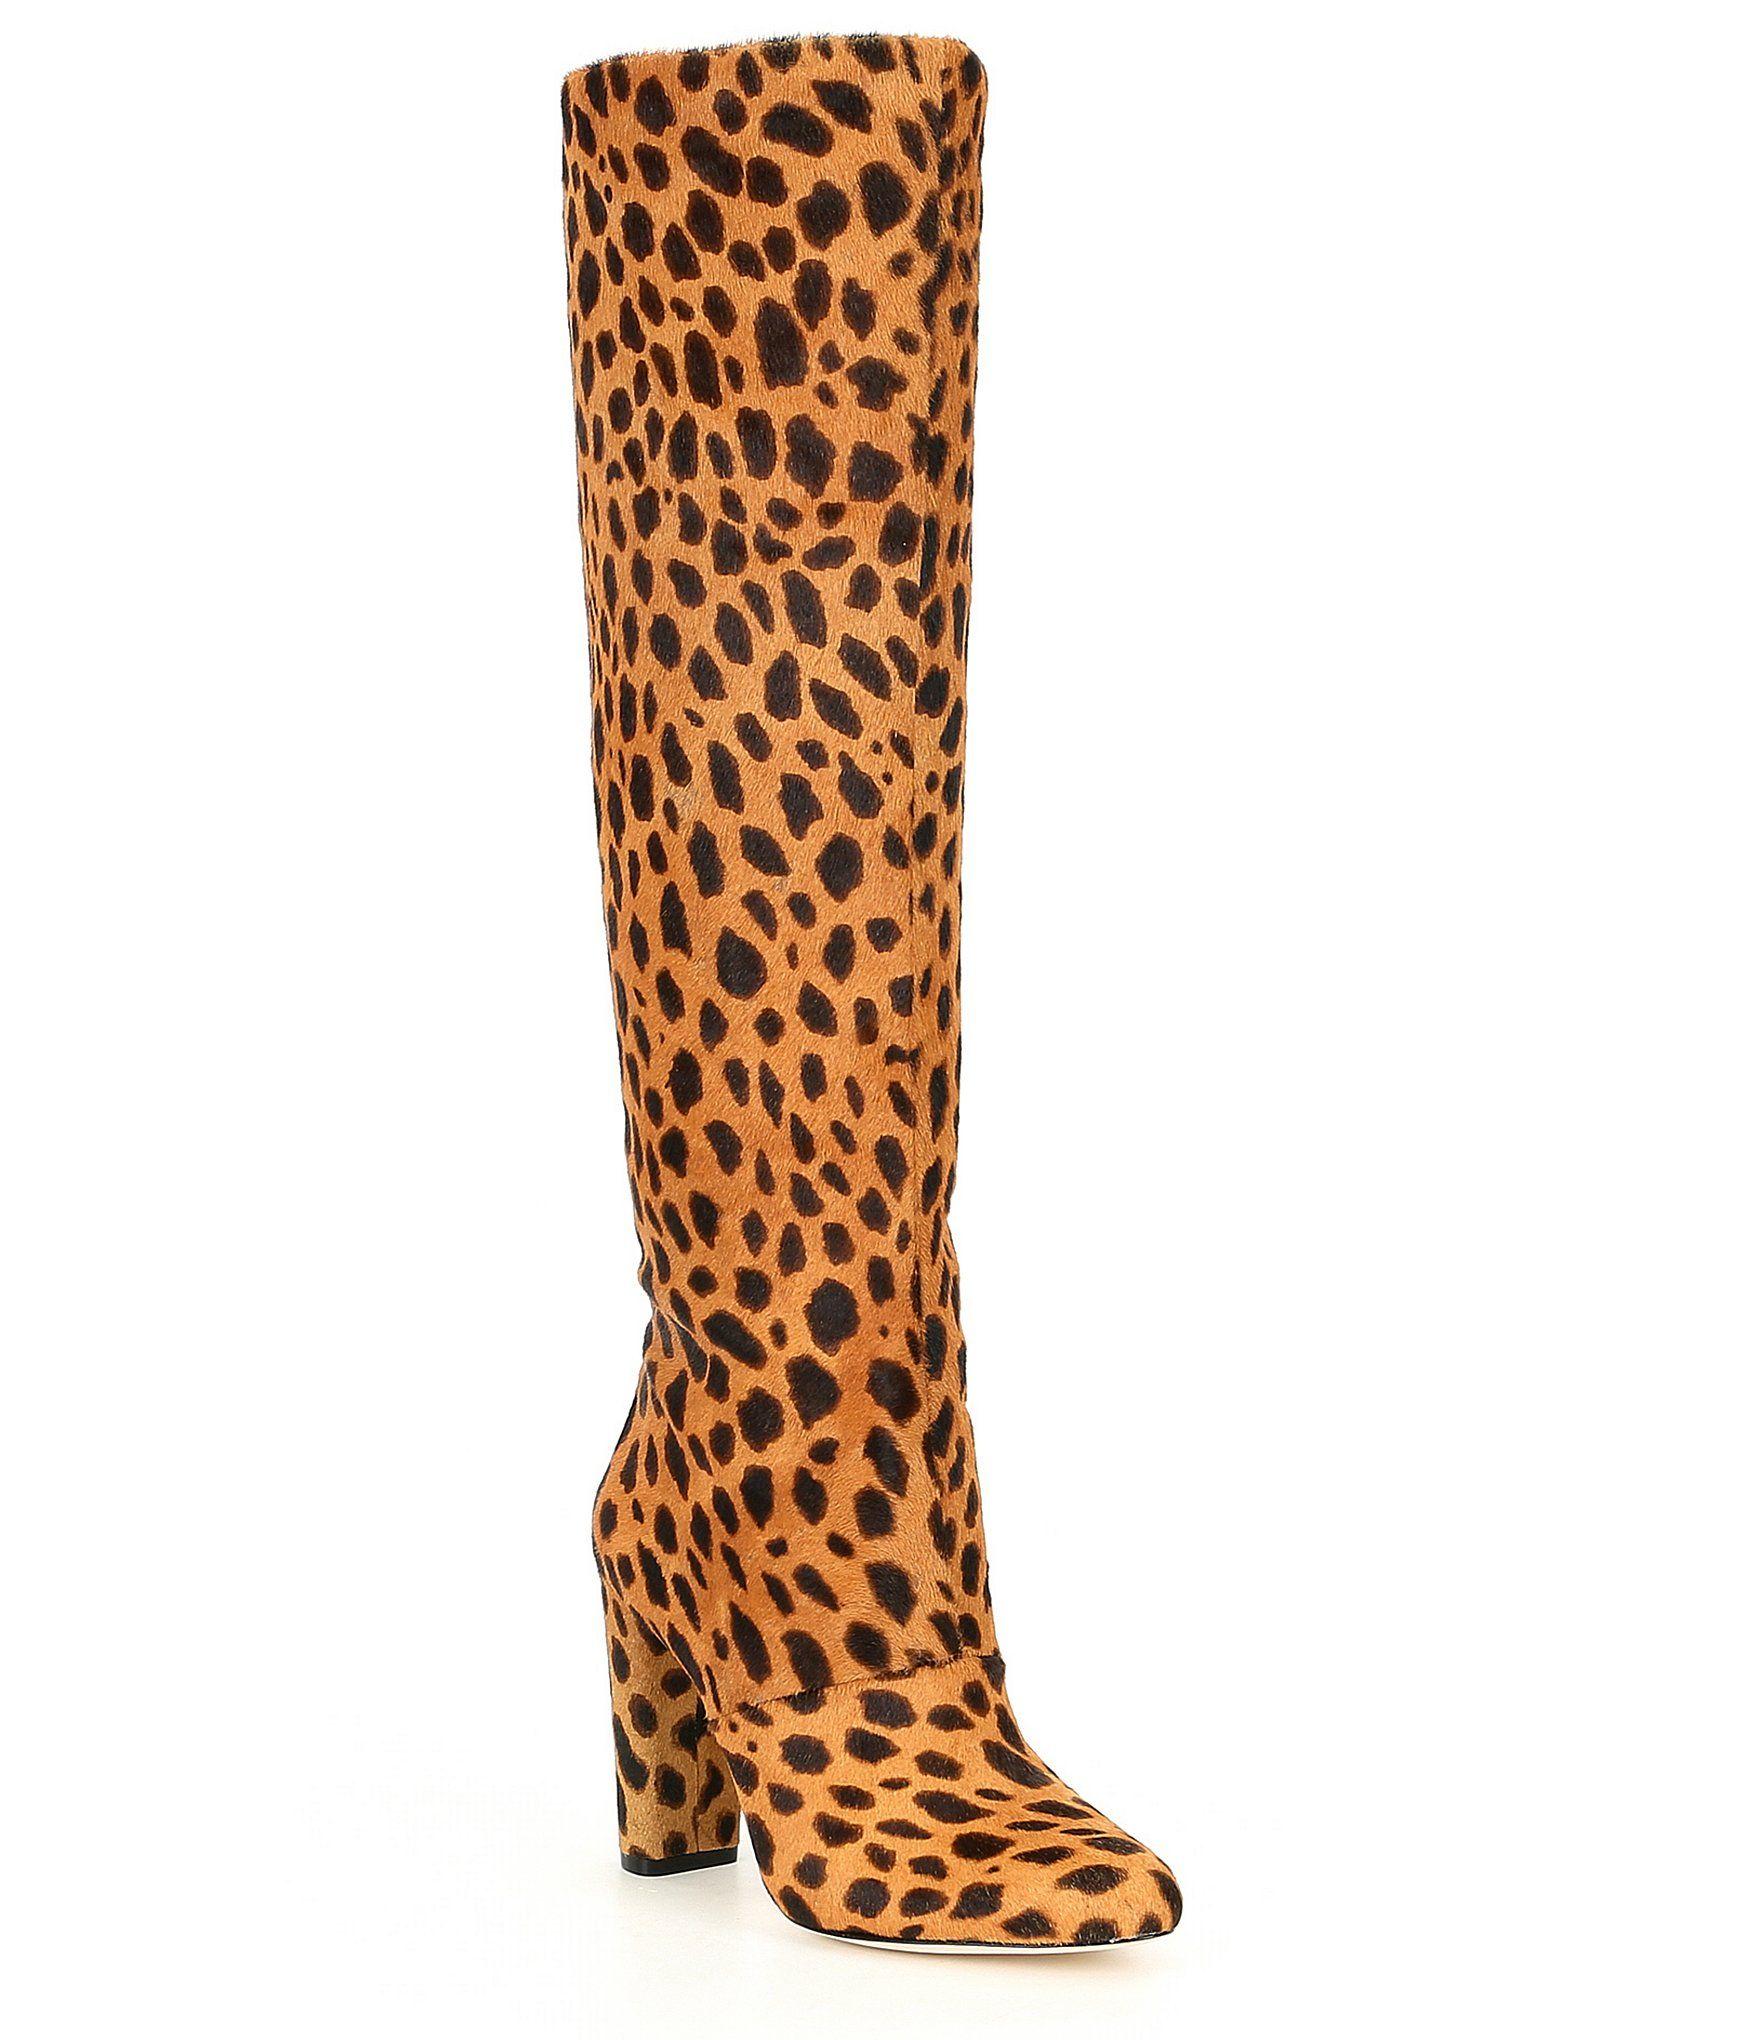 12a6ac27e Shop for Antonio Melani Calmma Leopard Print Tall Boots at Dillards.com.  Visit Dillards.com to find clothing, accessories, shoes, cosmetics & more.